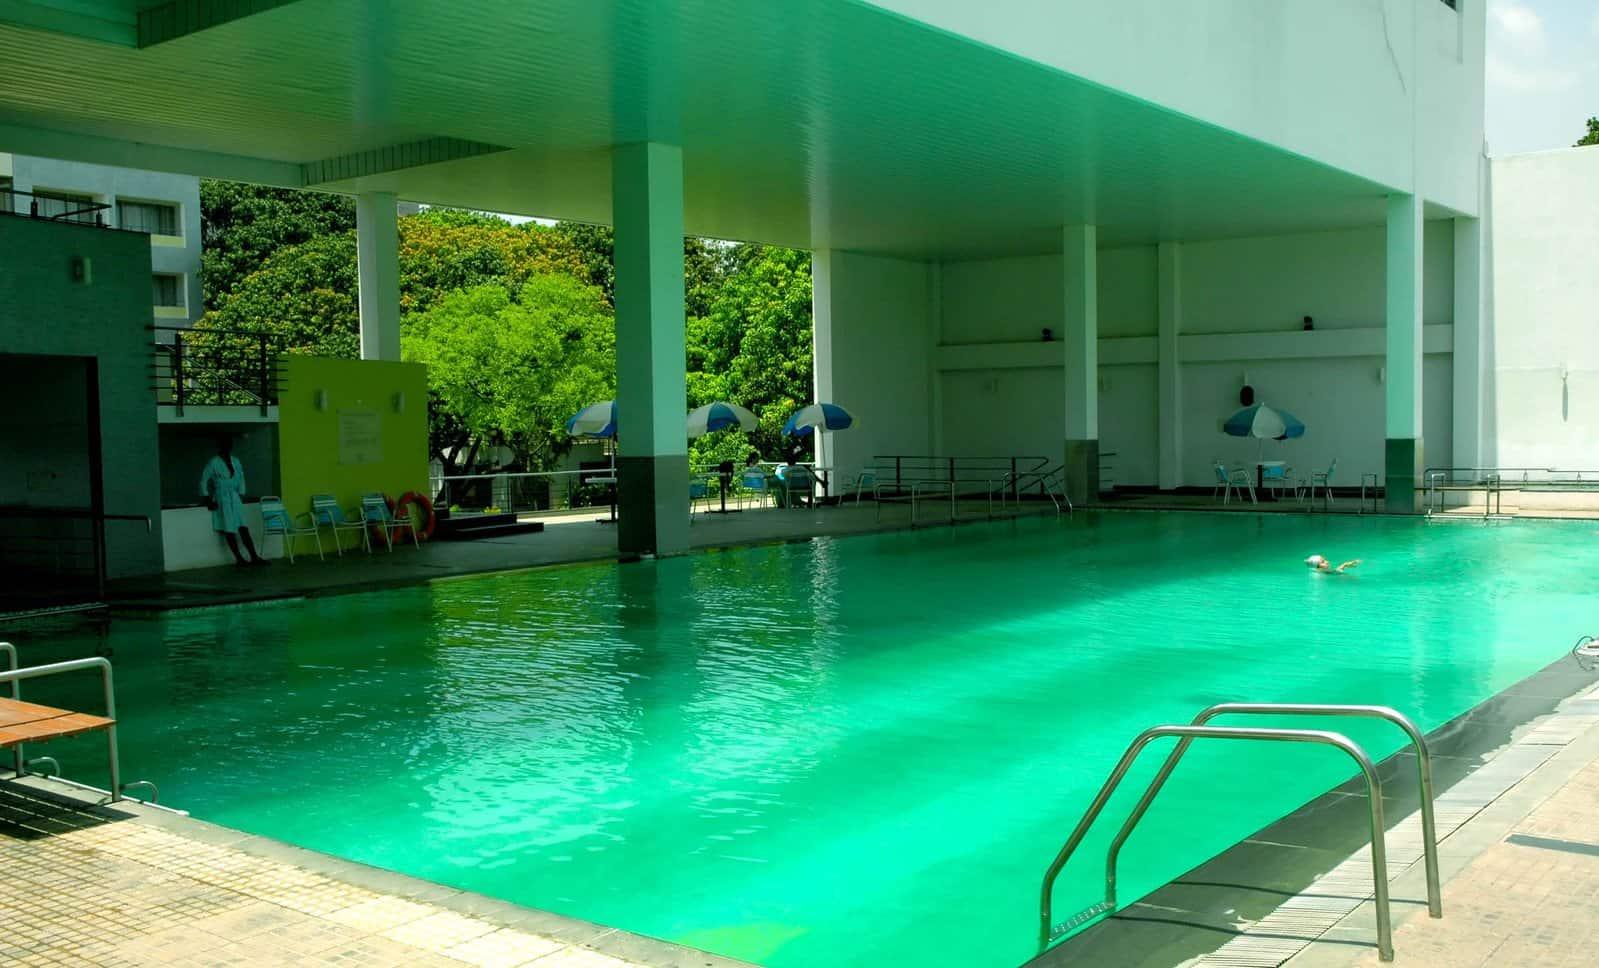 Pool installation company in Phoenix